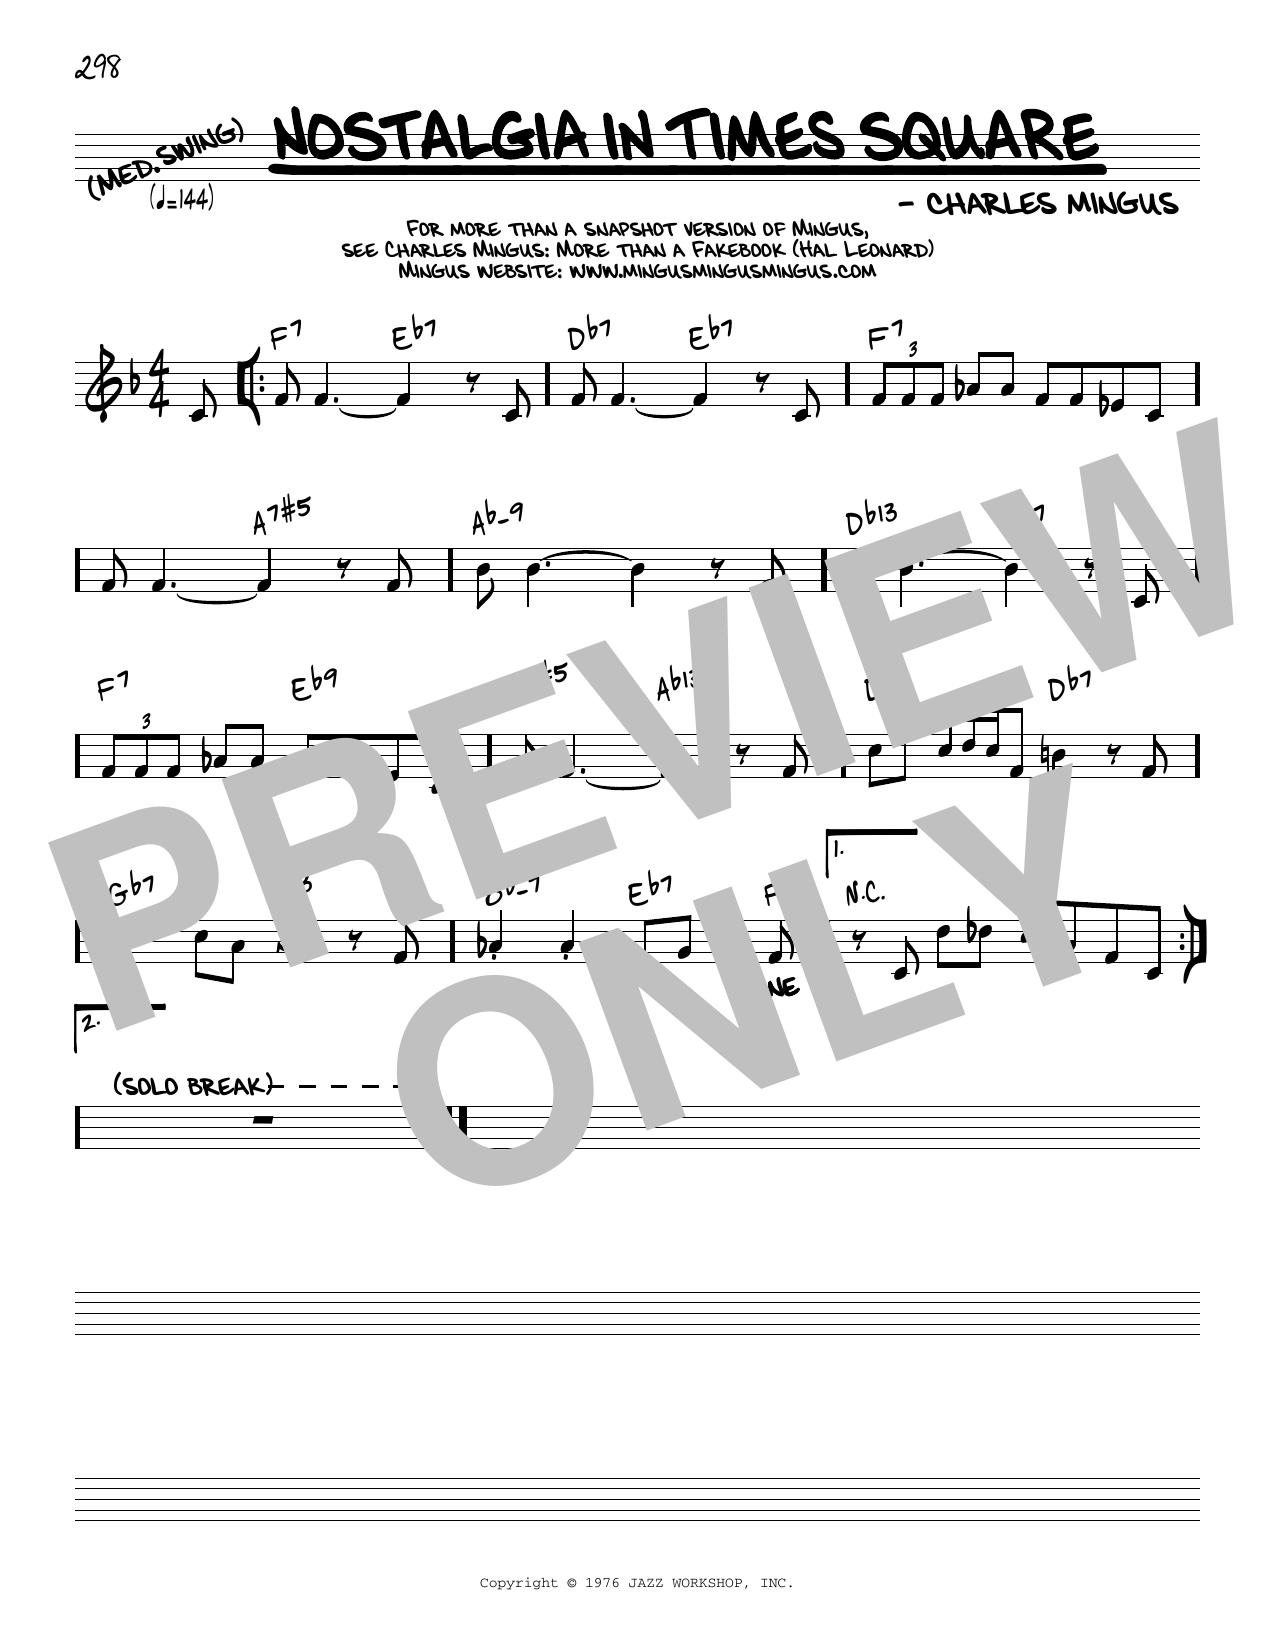 Charles Mingus Nostalgia In Times Square [Reharmonized version] (arr. Jack Grassel) sheet music notes printable PDF score